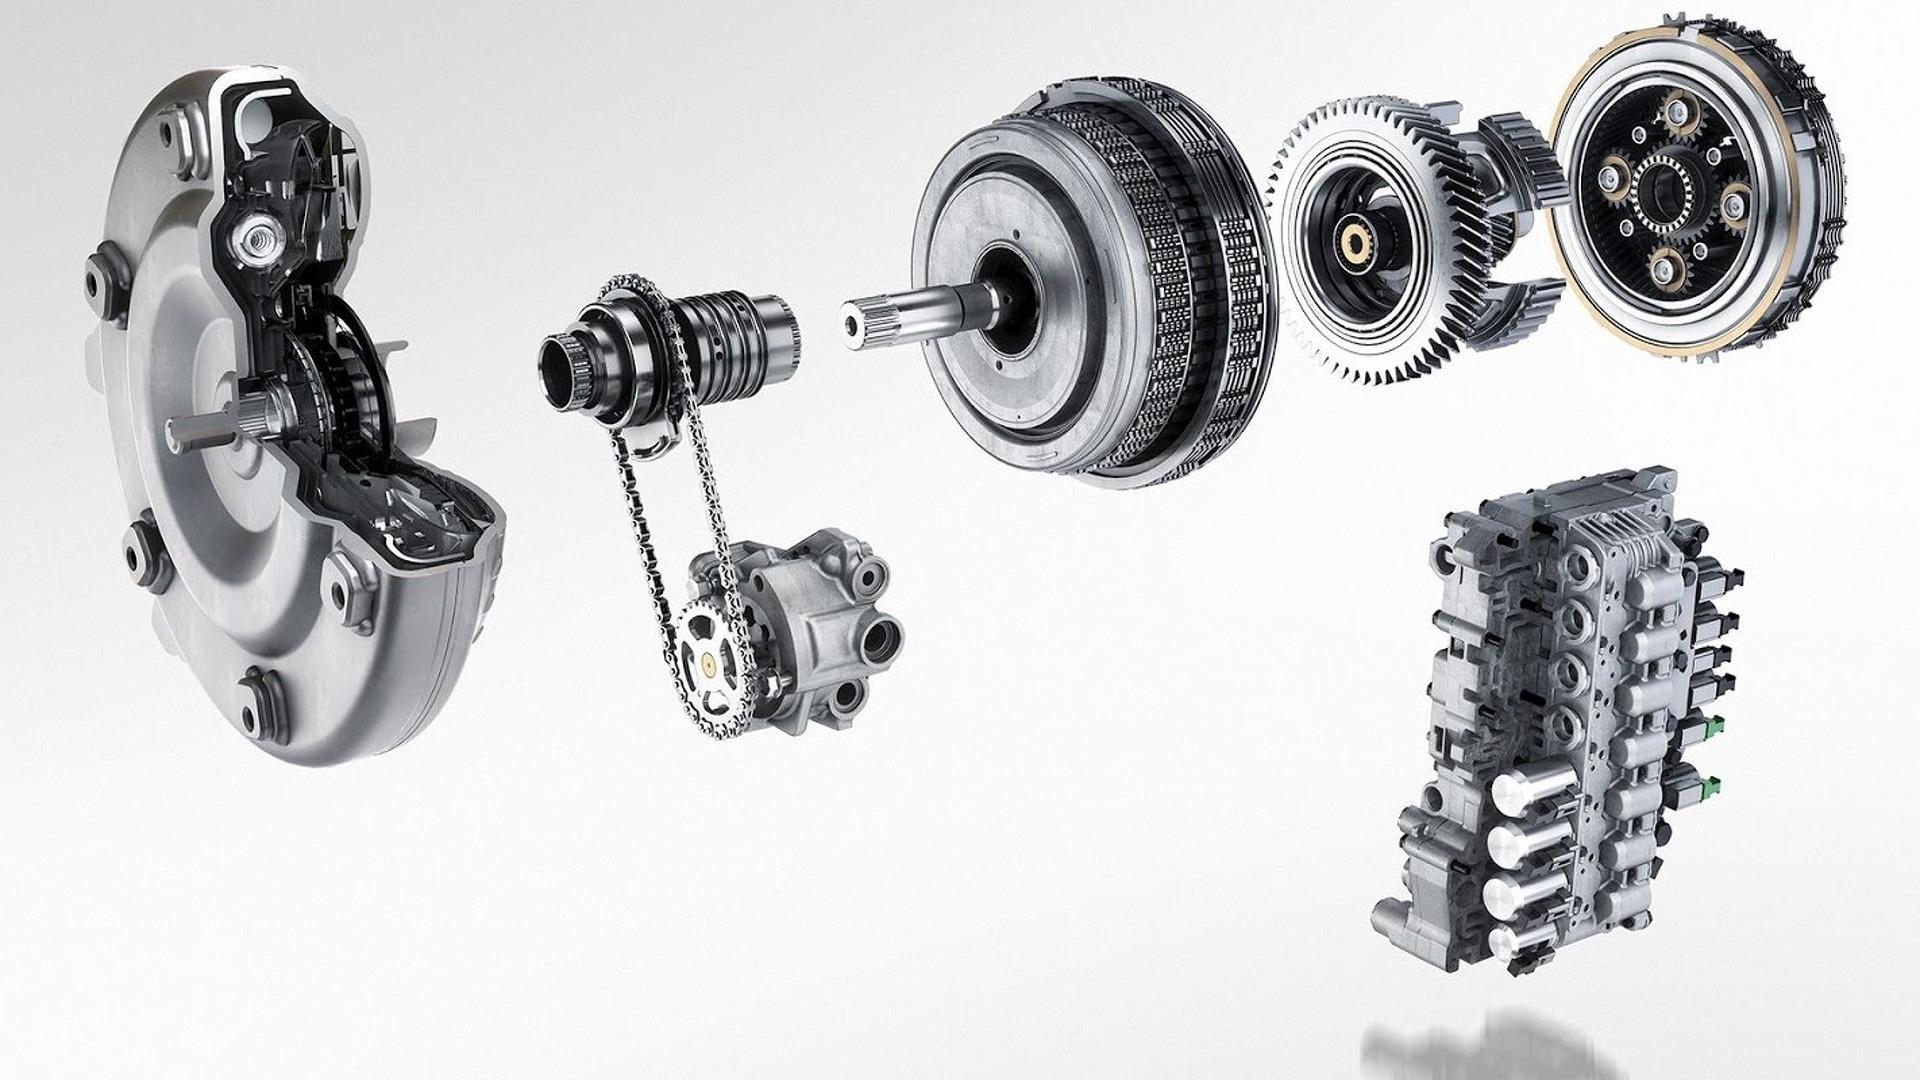 2018-peugeot-308-facelift (13)